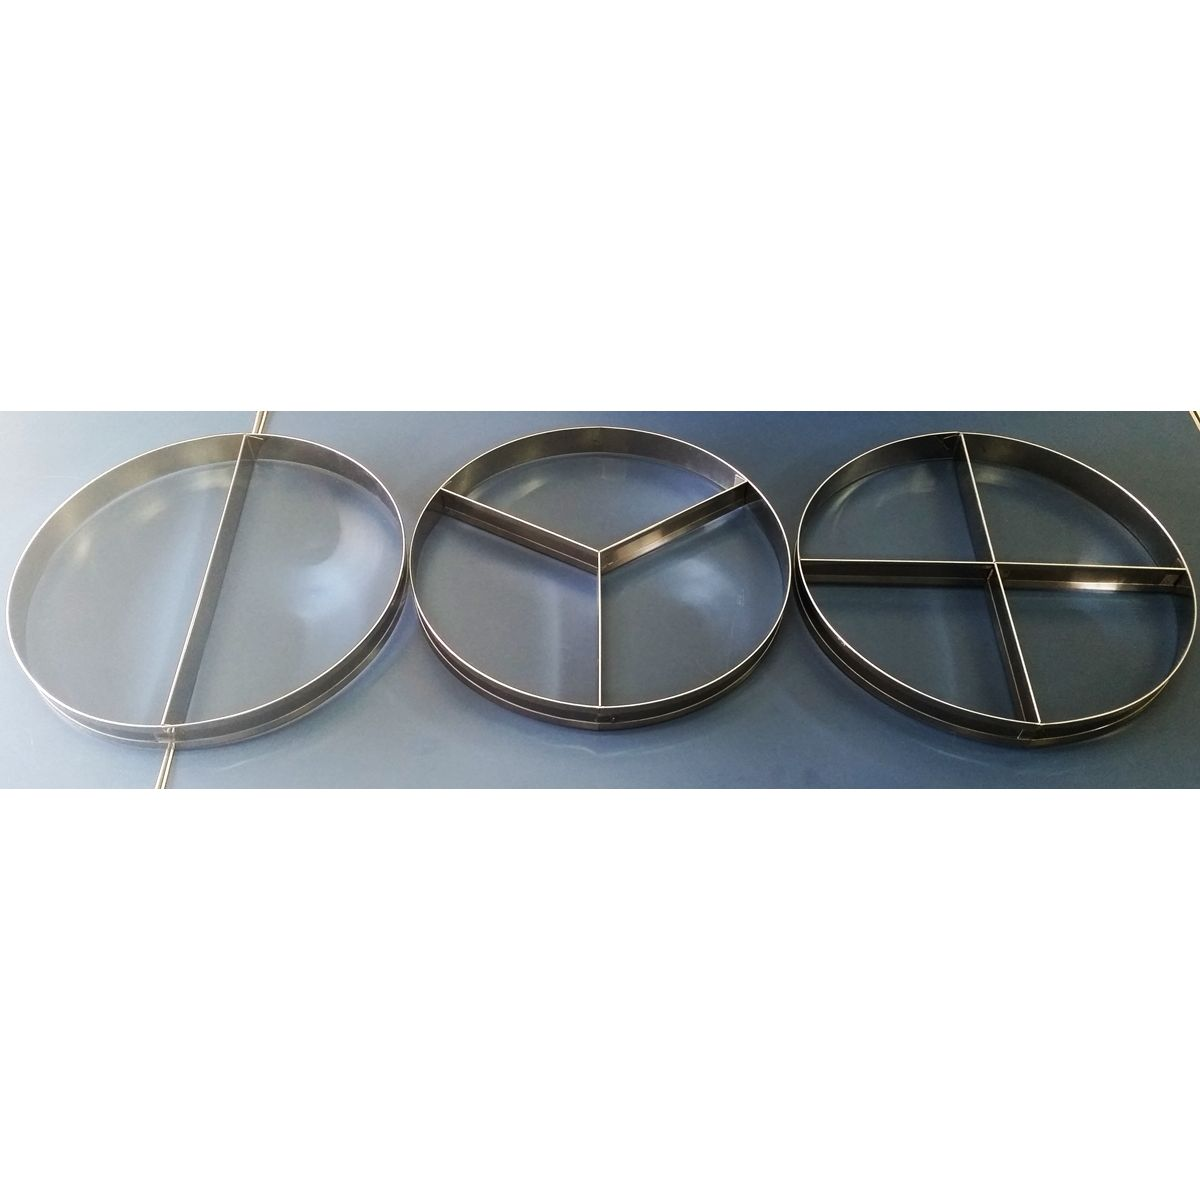 APARTADORES - 2, 3 e 4 SABORES INOX. P/PIZZAS DE 50 CM  - Fórum de Pizzas Vendas online